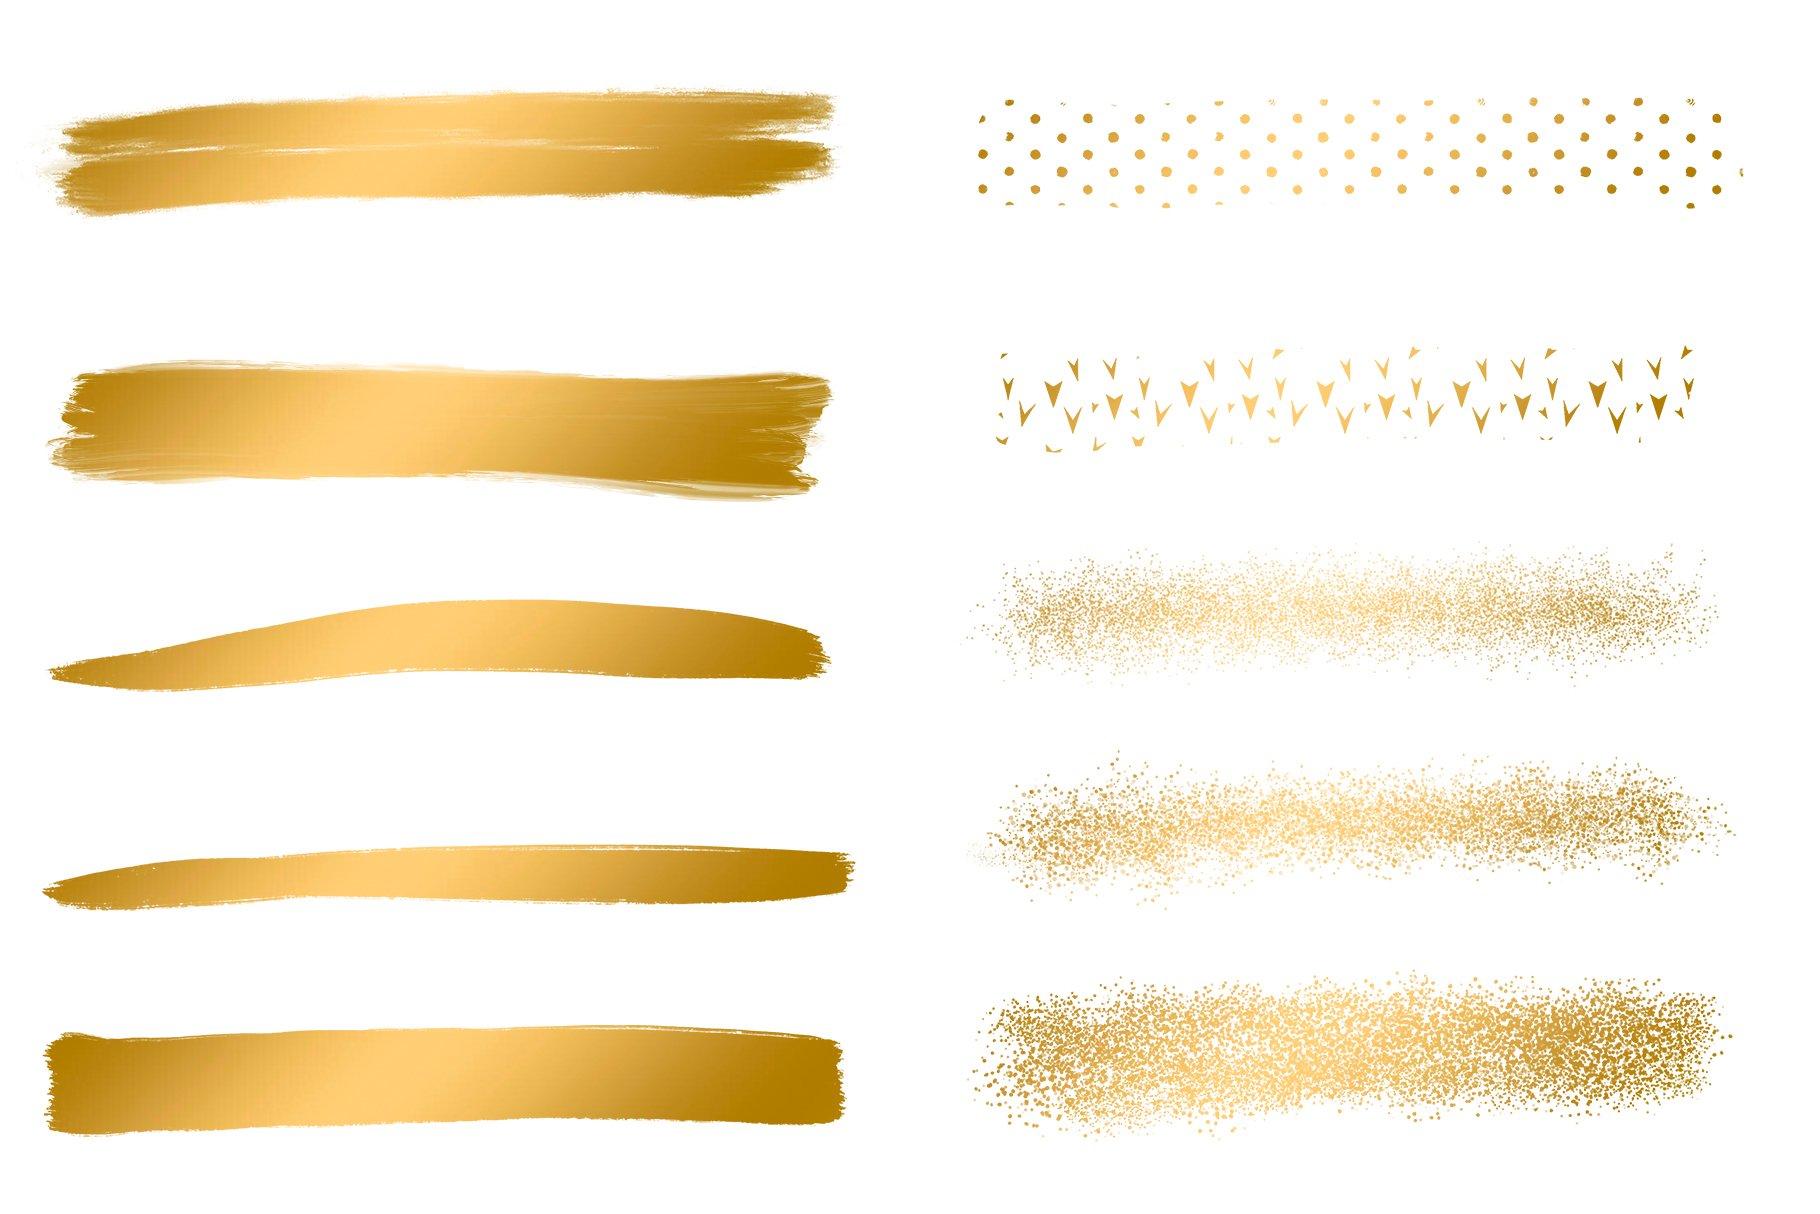 Gold Brush Strokes, Brush Strokes example image 3